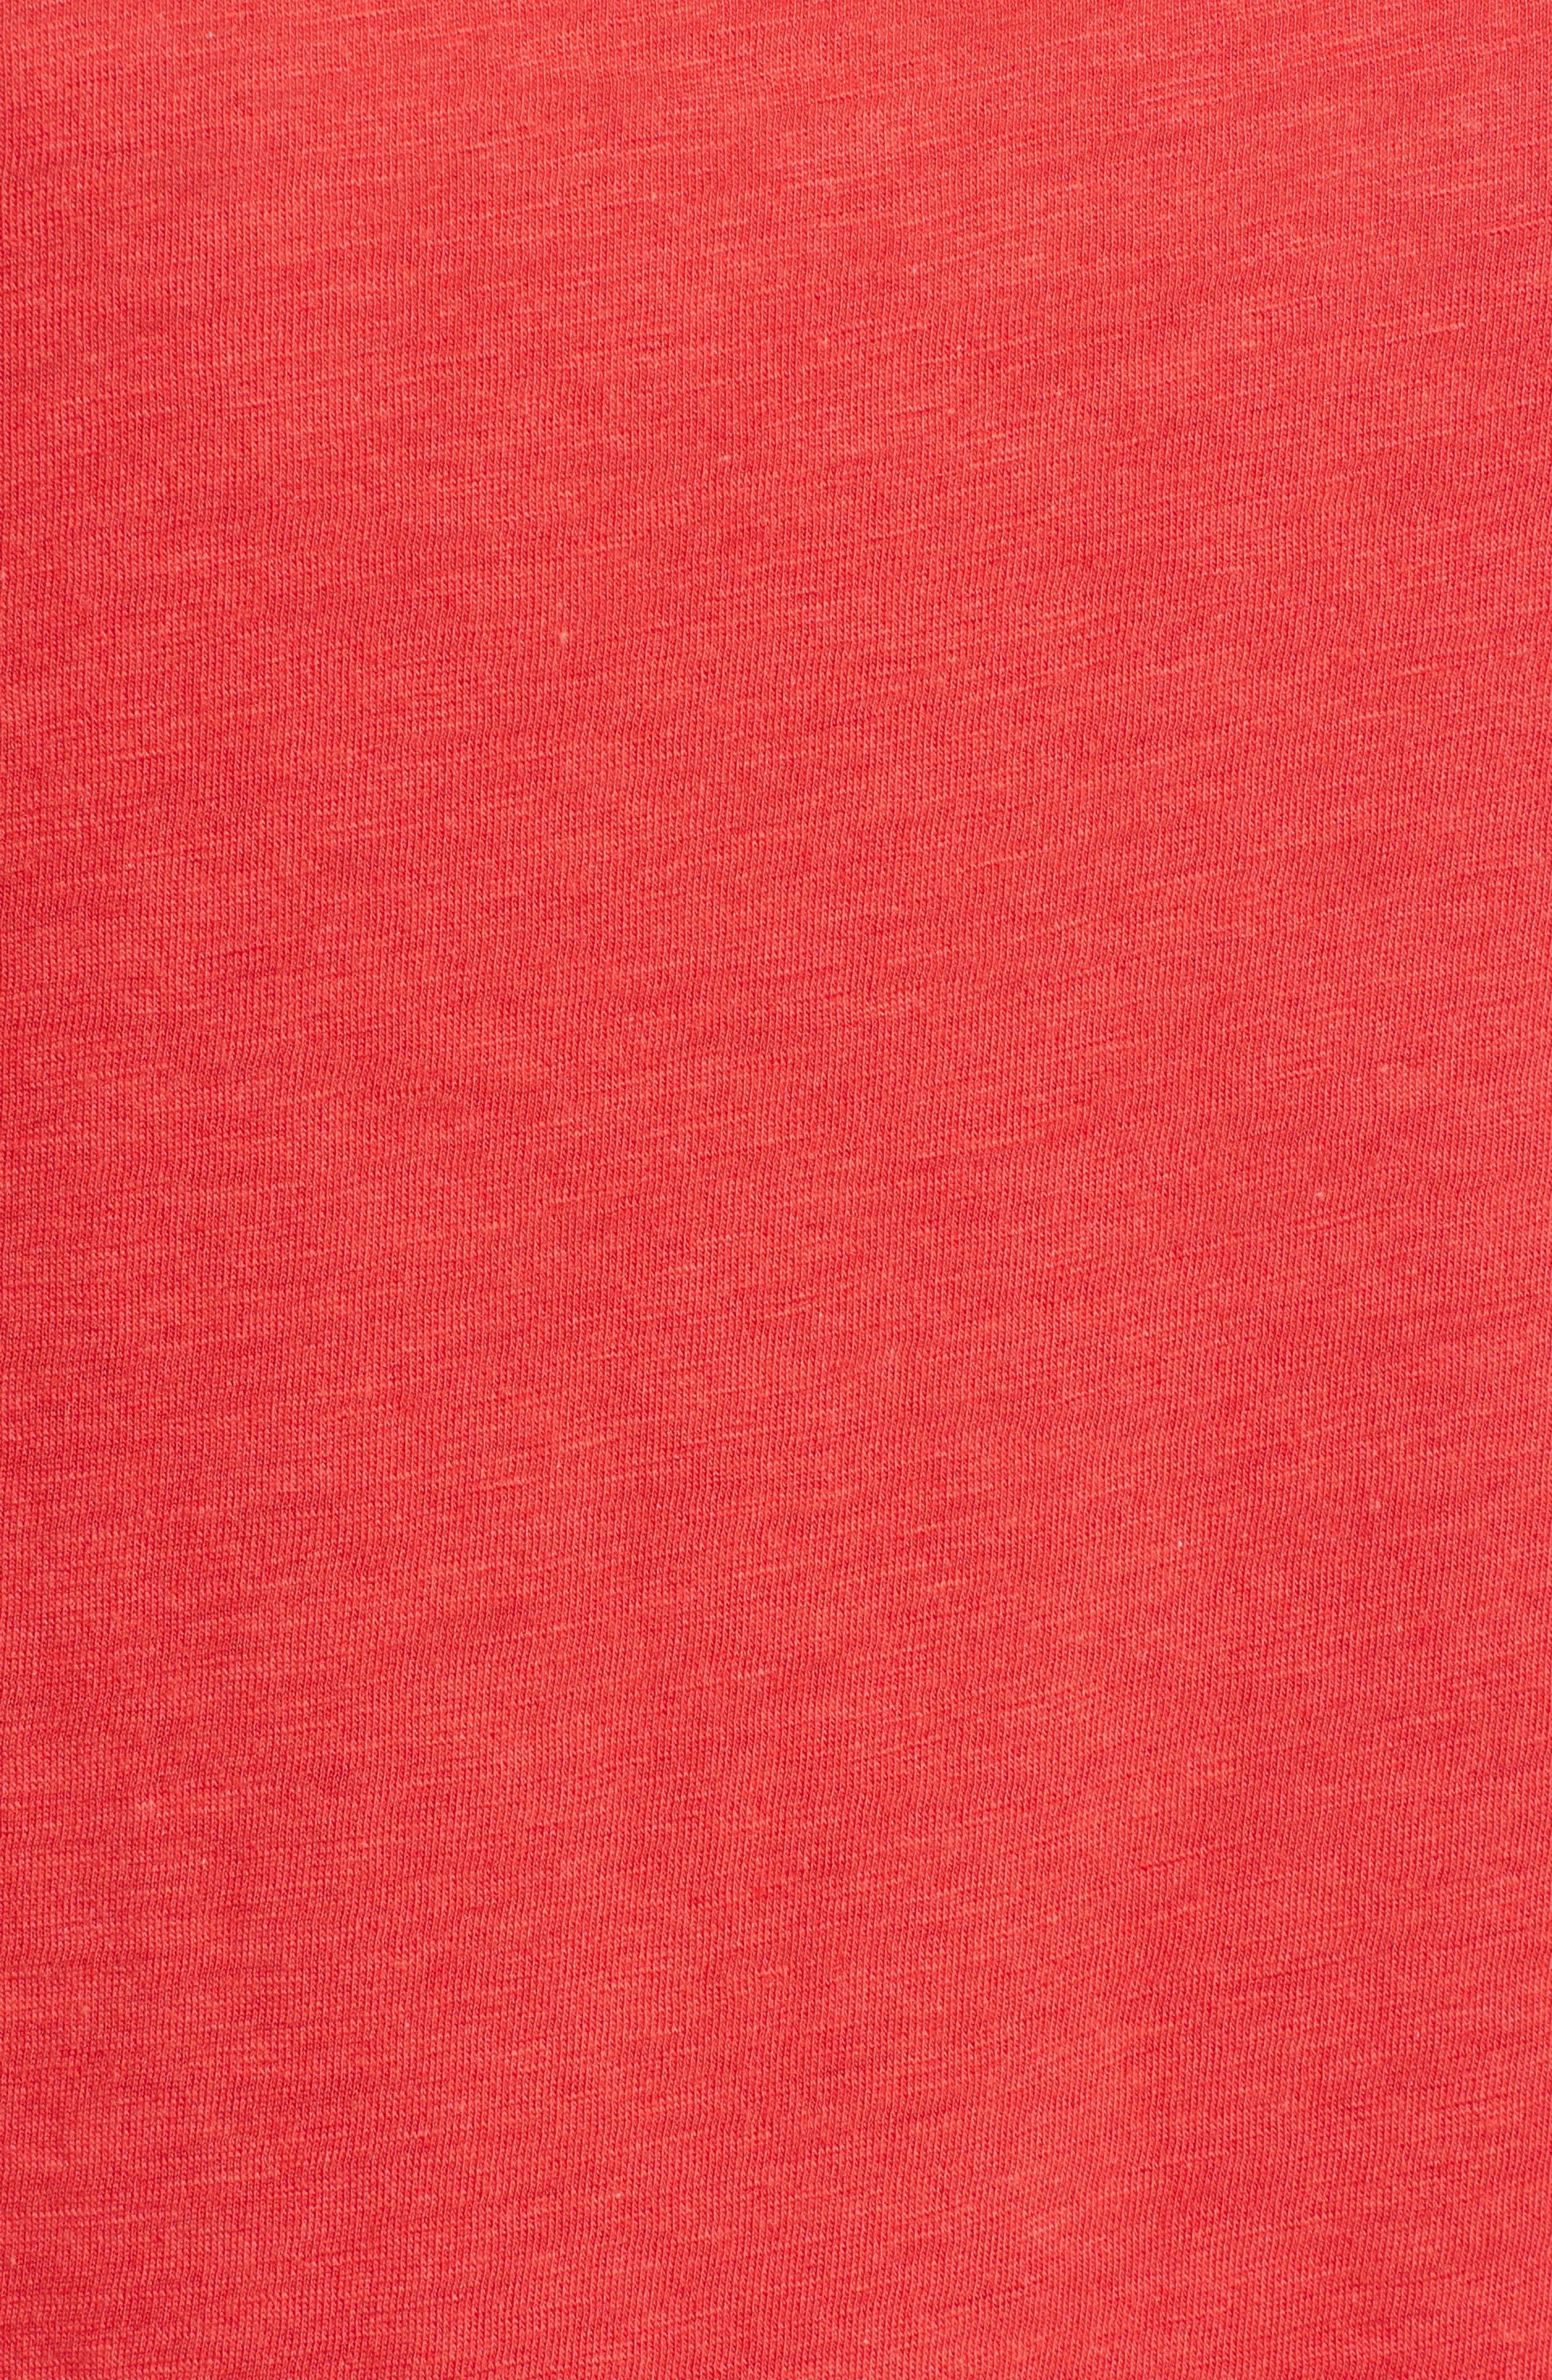 Stripe Sleeve Cotton Blend Athletic Tee,                             Alternate thumbnail 21, color,